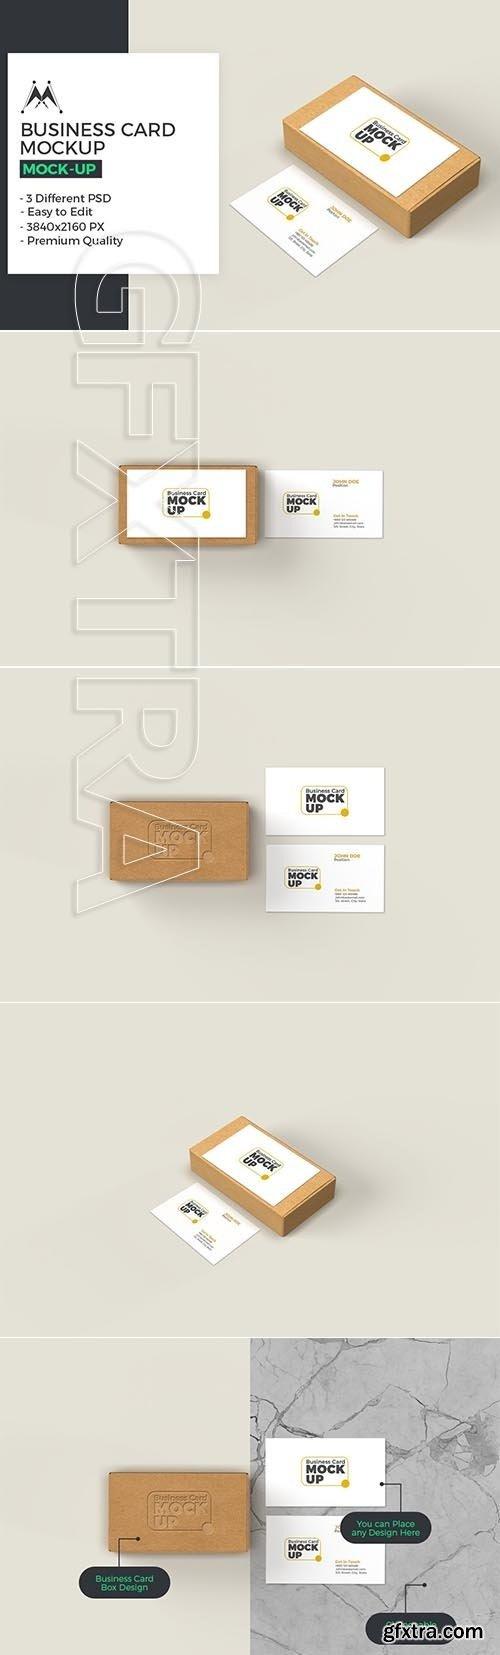 CreativeMarket - Business Card with Box Mockup 5717484